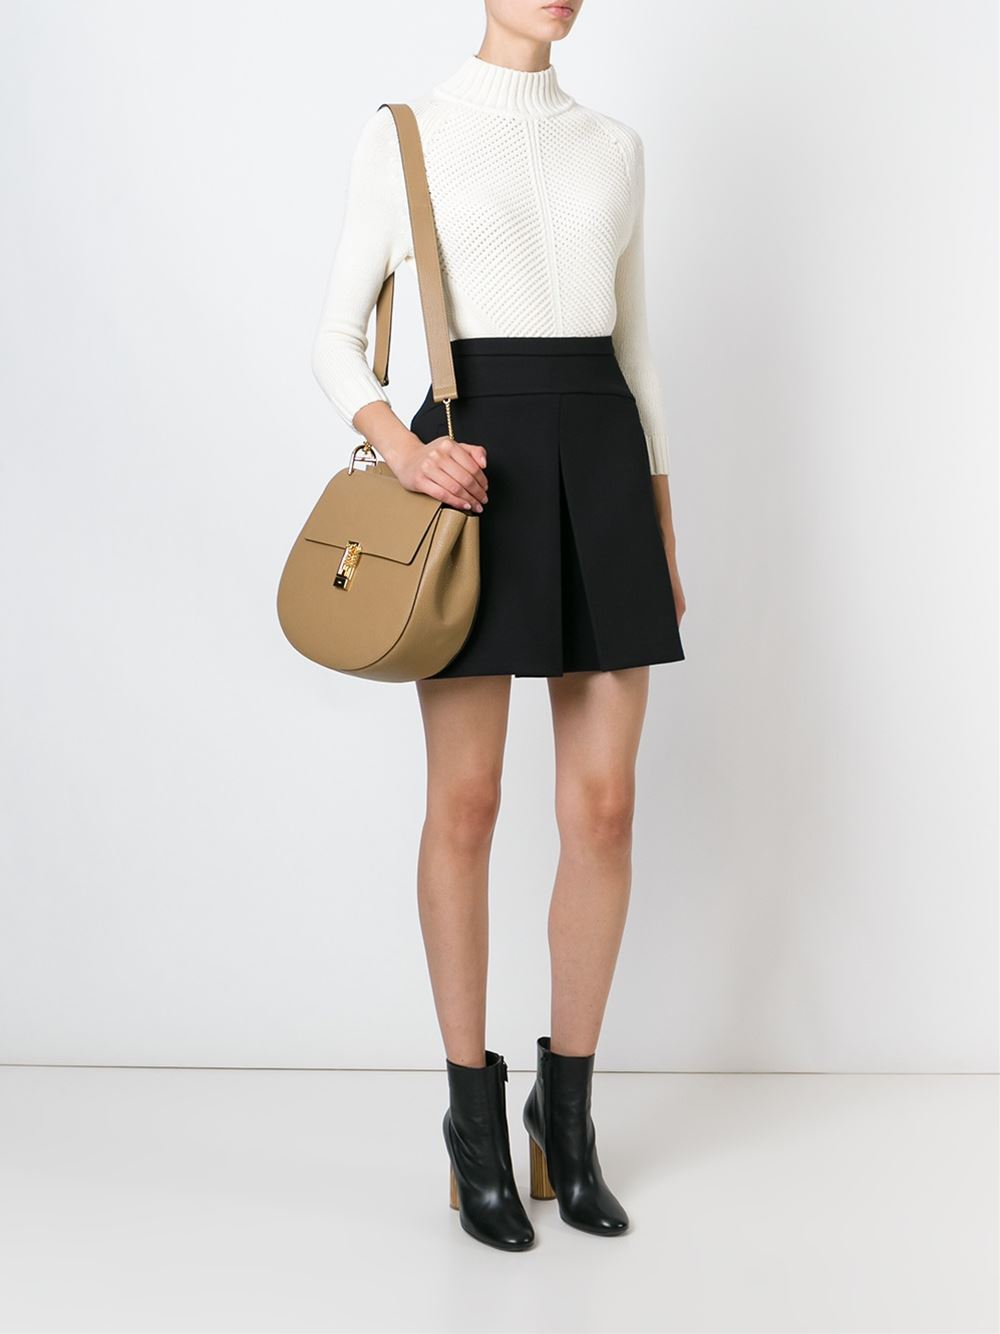 dc9a5eb2 Chloé Large 'Drew' Shoulder Bag in Brown - Lyst